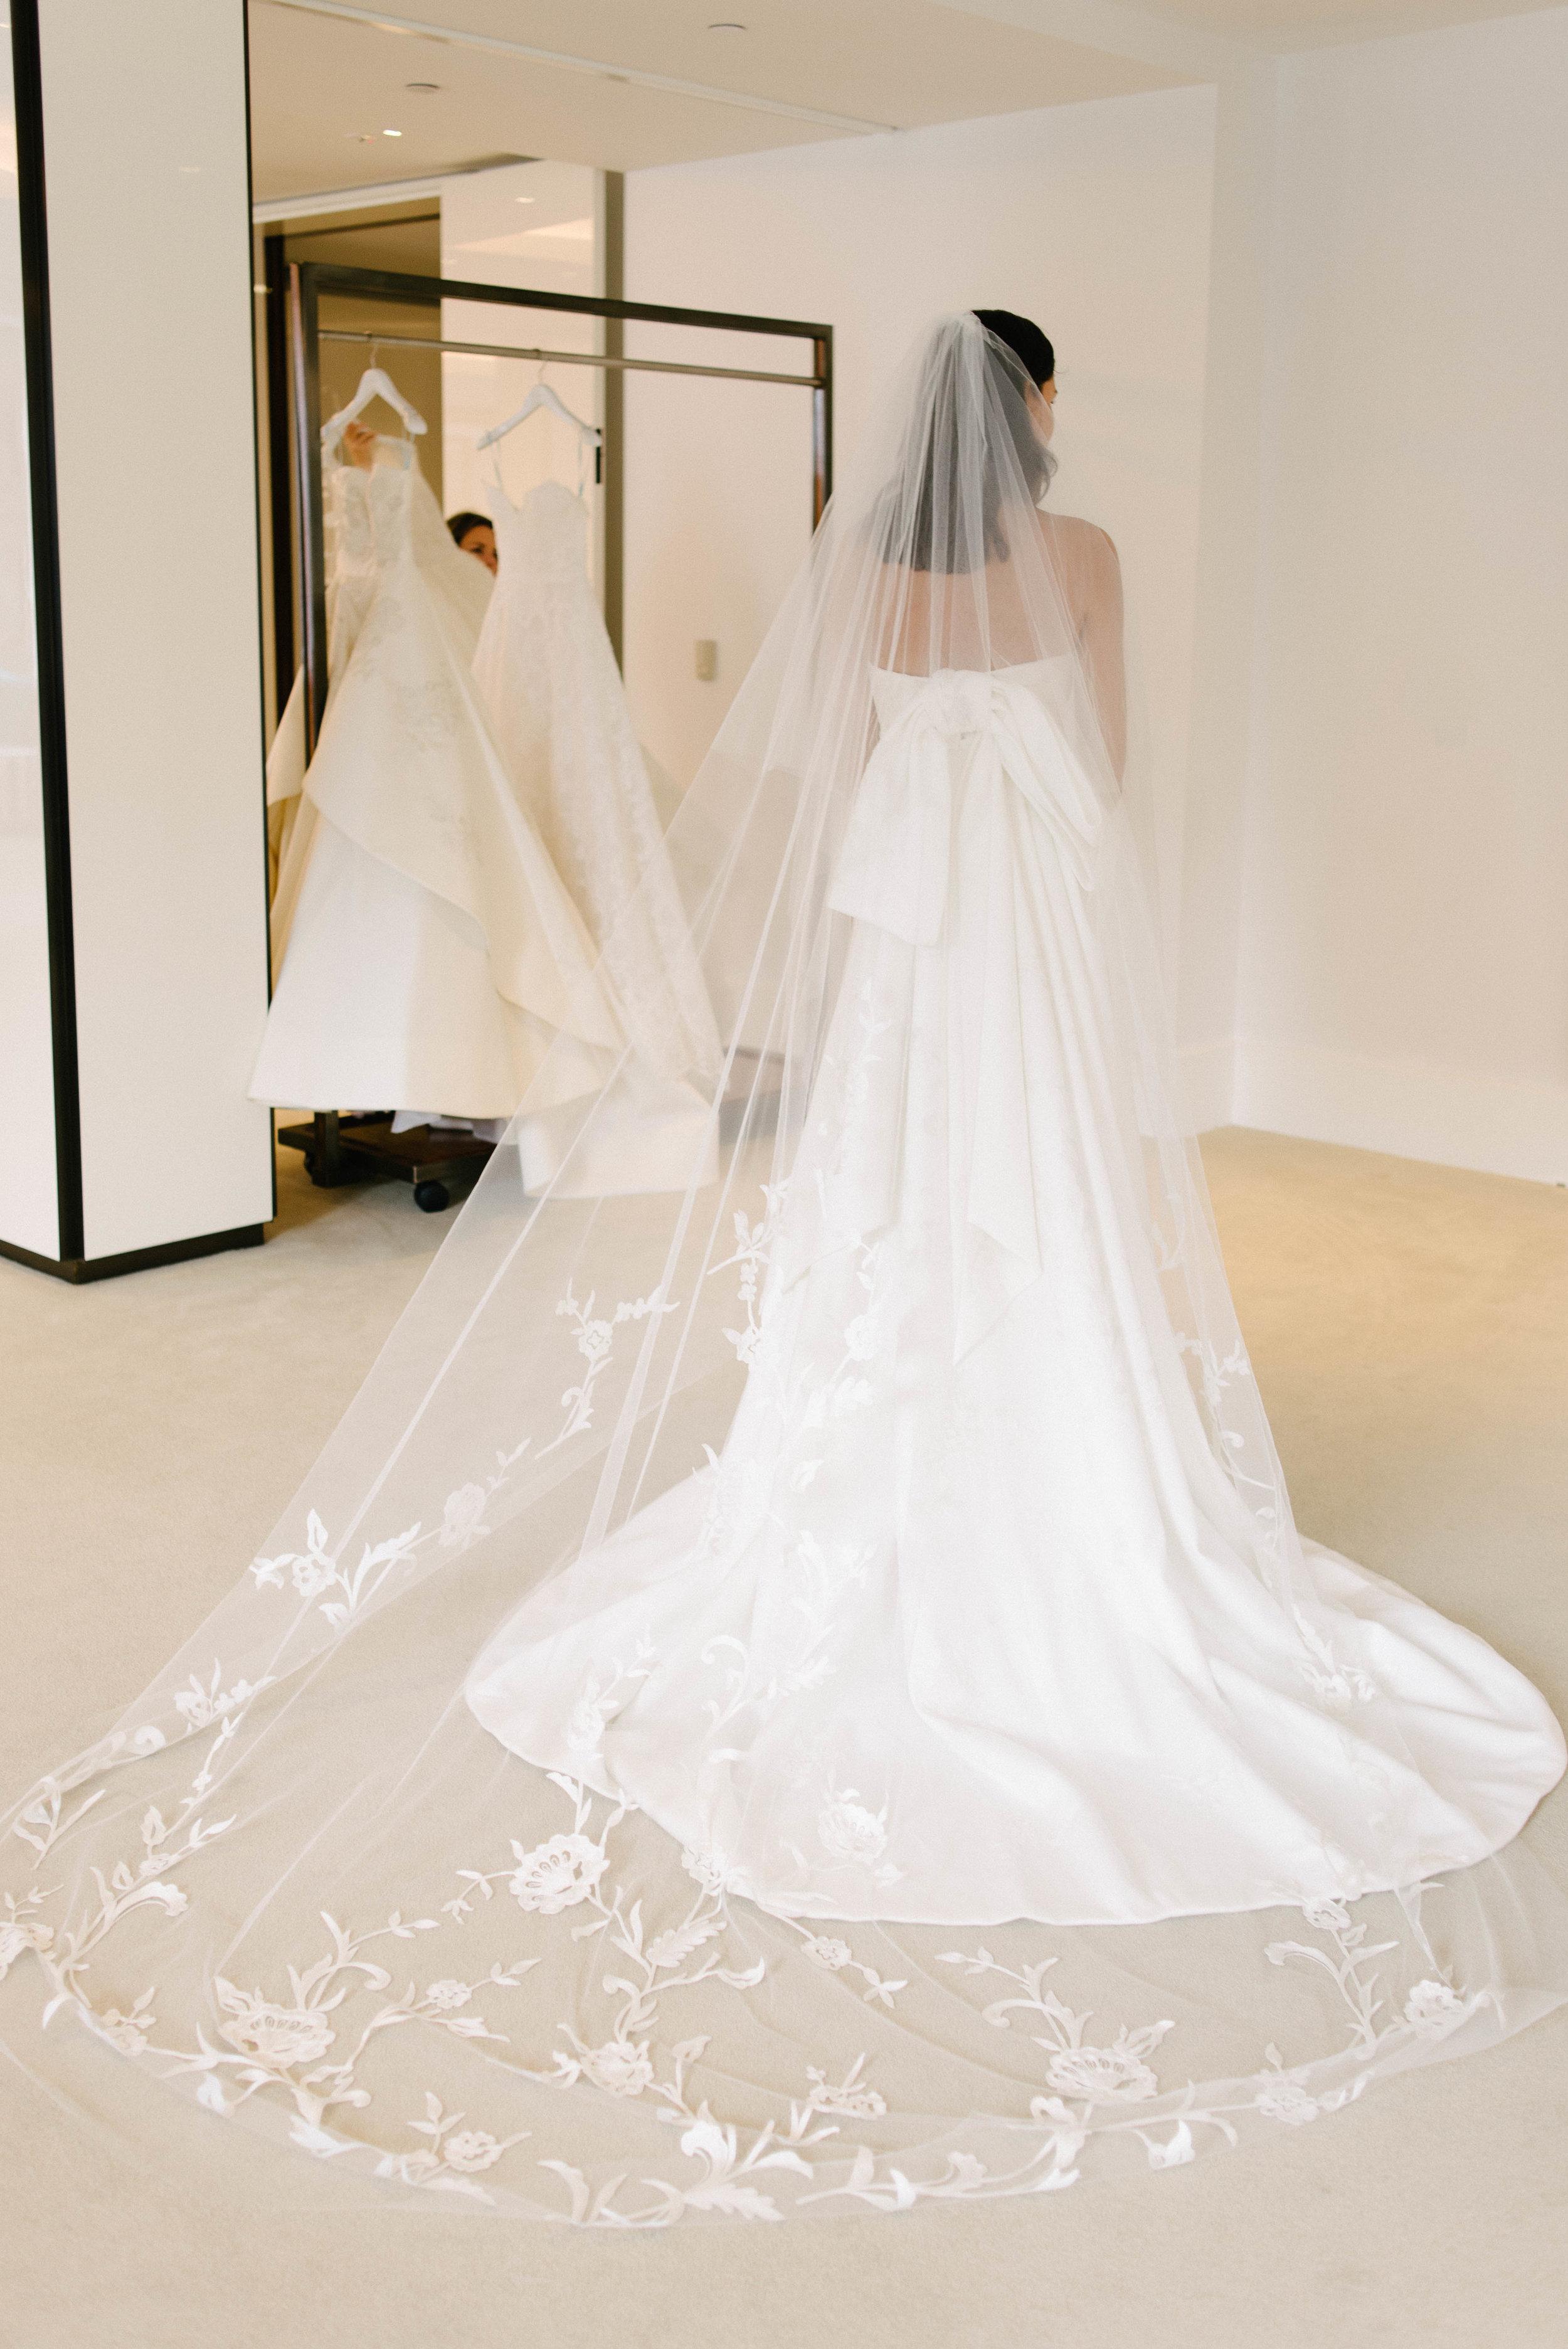 Bridal Fashion Week Trends 2019, New York Bridal Fashion Week, Bridal Market, Statement Veils